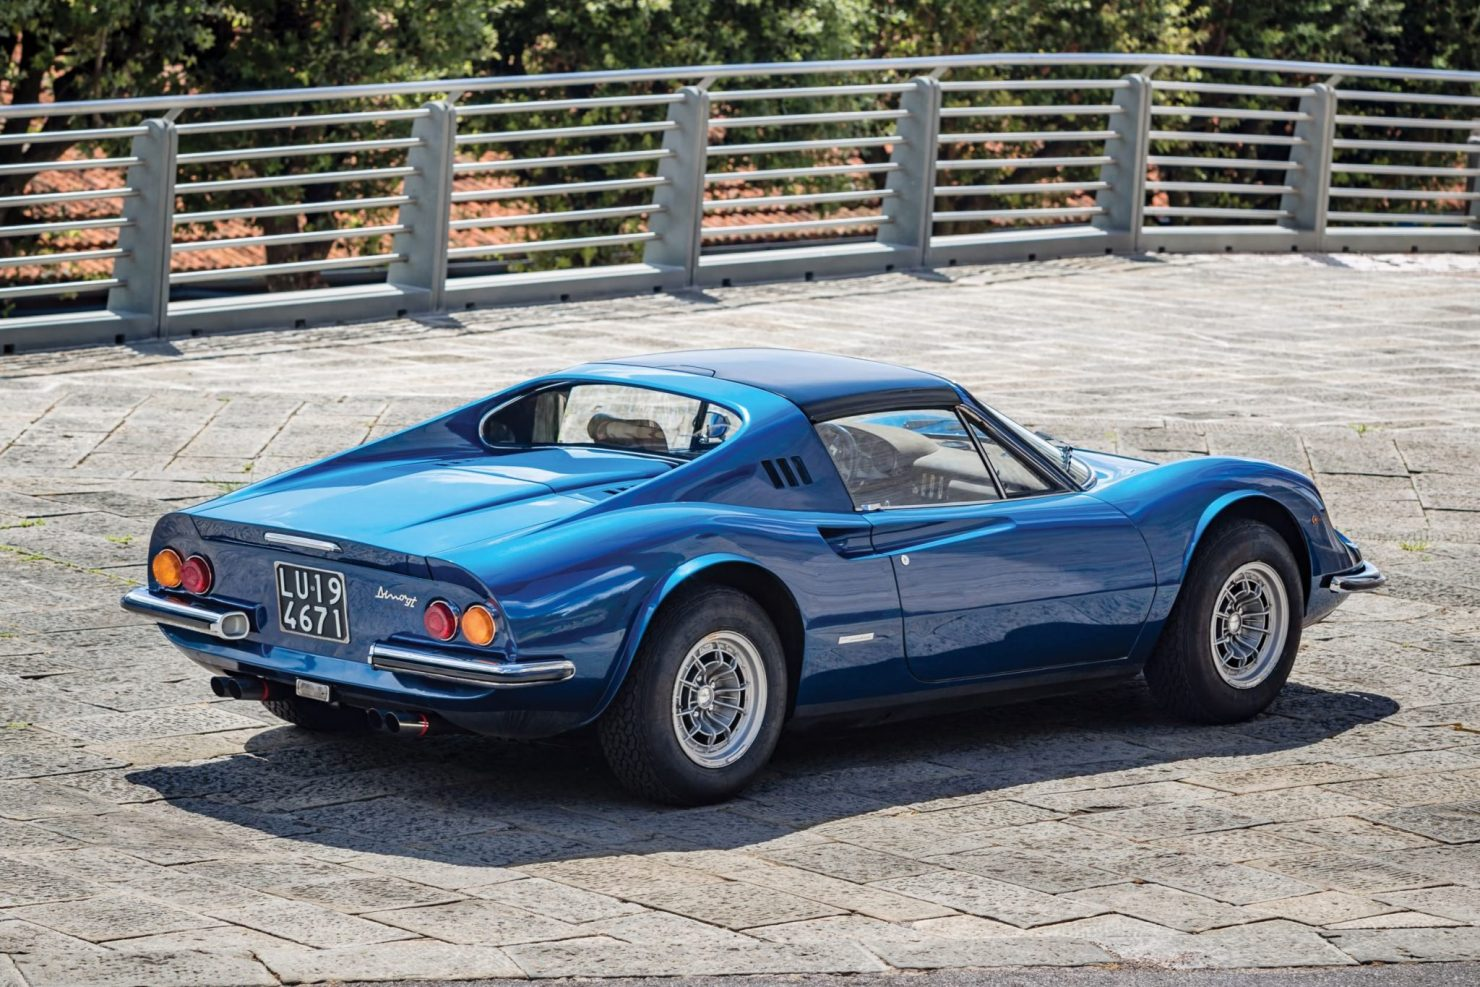 ferrari dino 246 gts car 2 1480x987 - 1973 Ferrari Dino 246 GTS